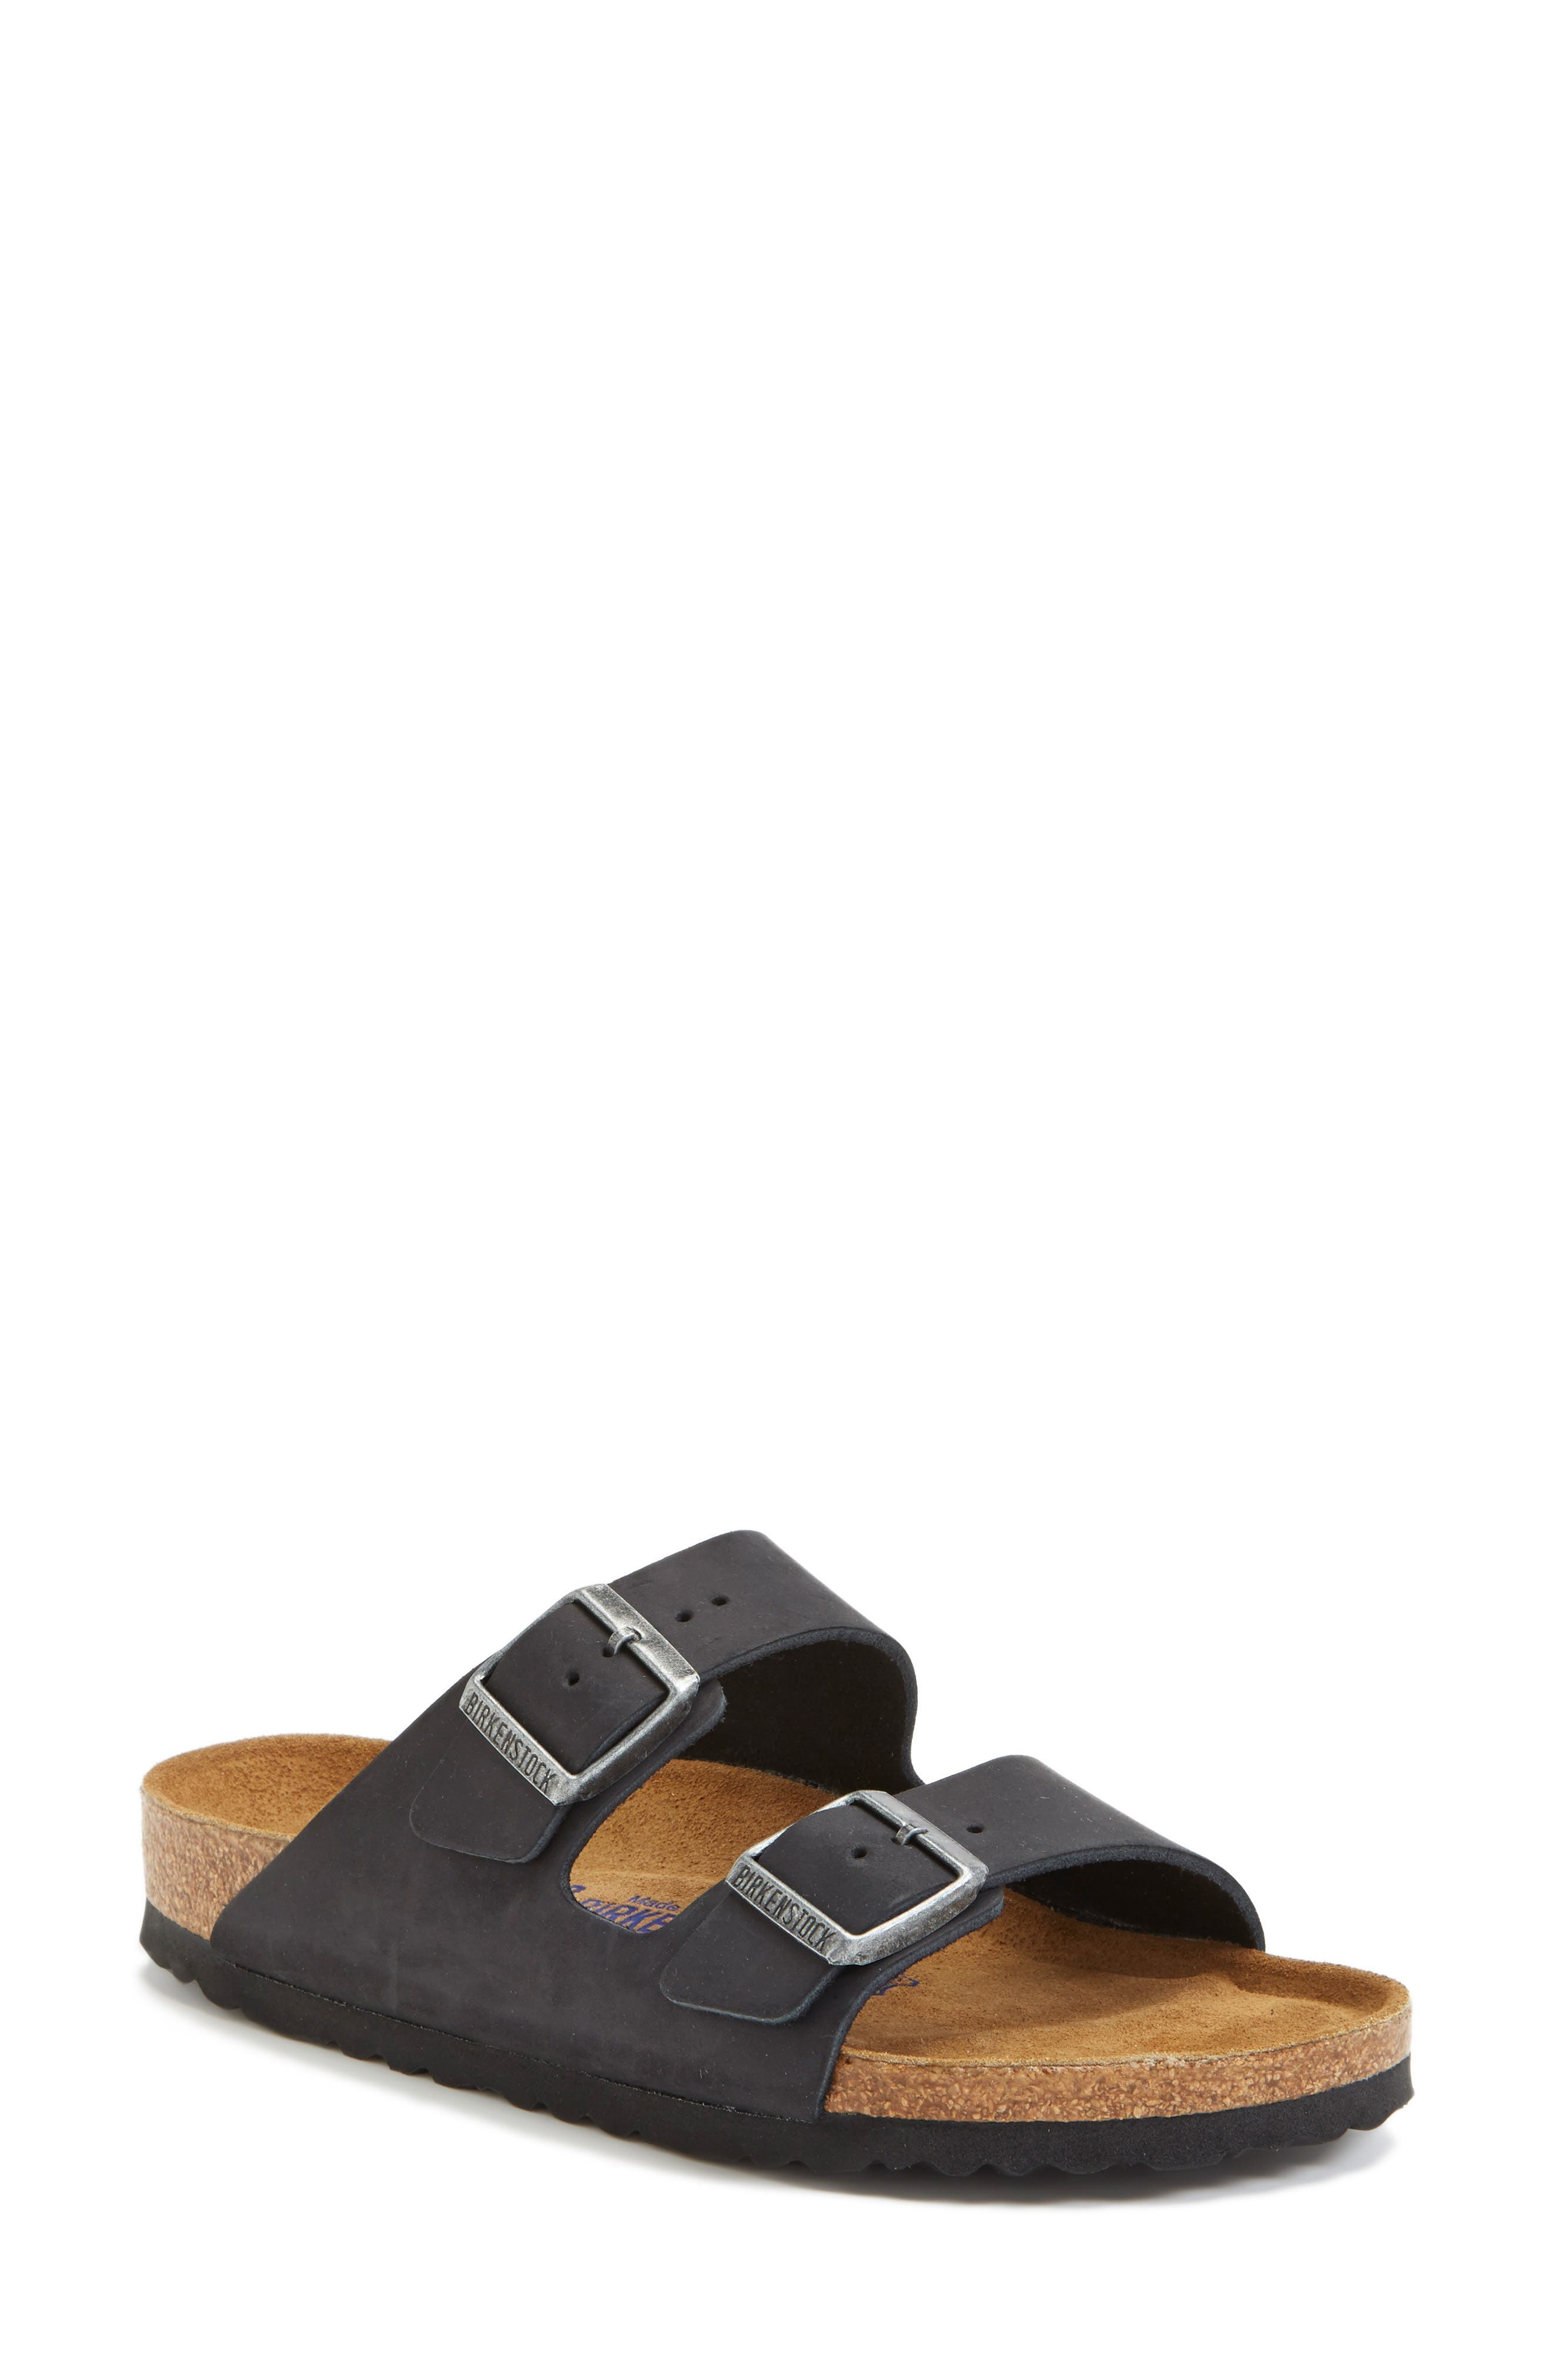 90a146f5d071 Women s Birkenstock  Arizona  Soft Footbed Sandal